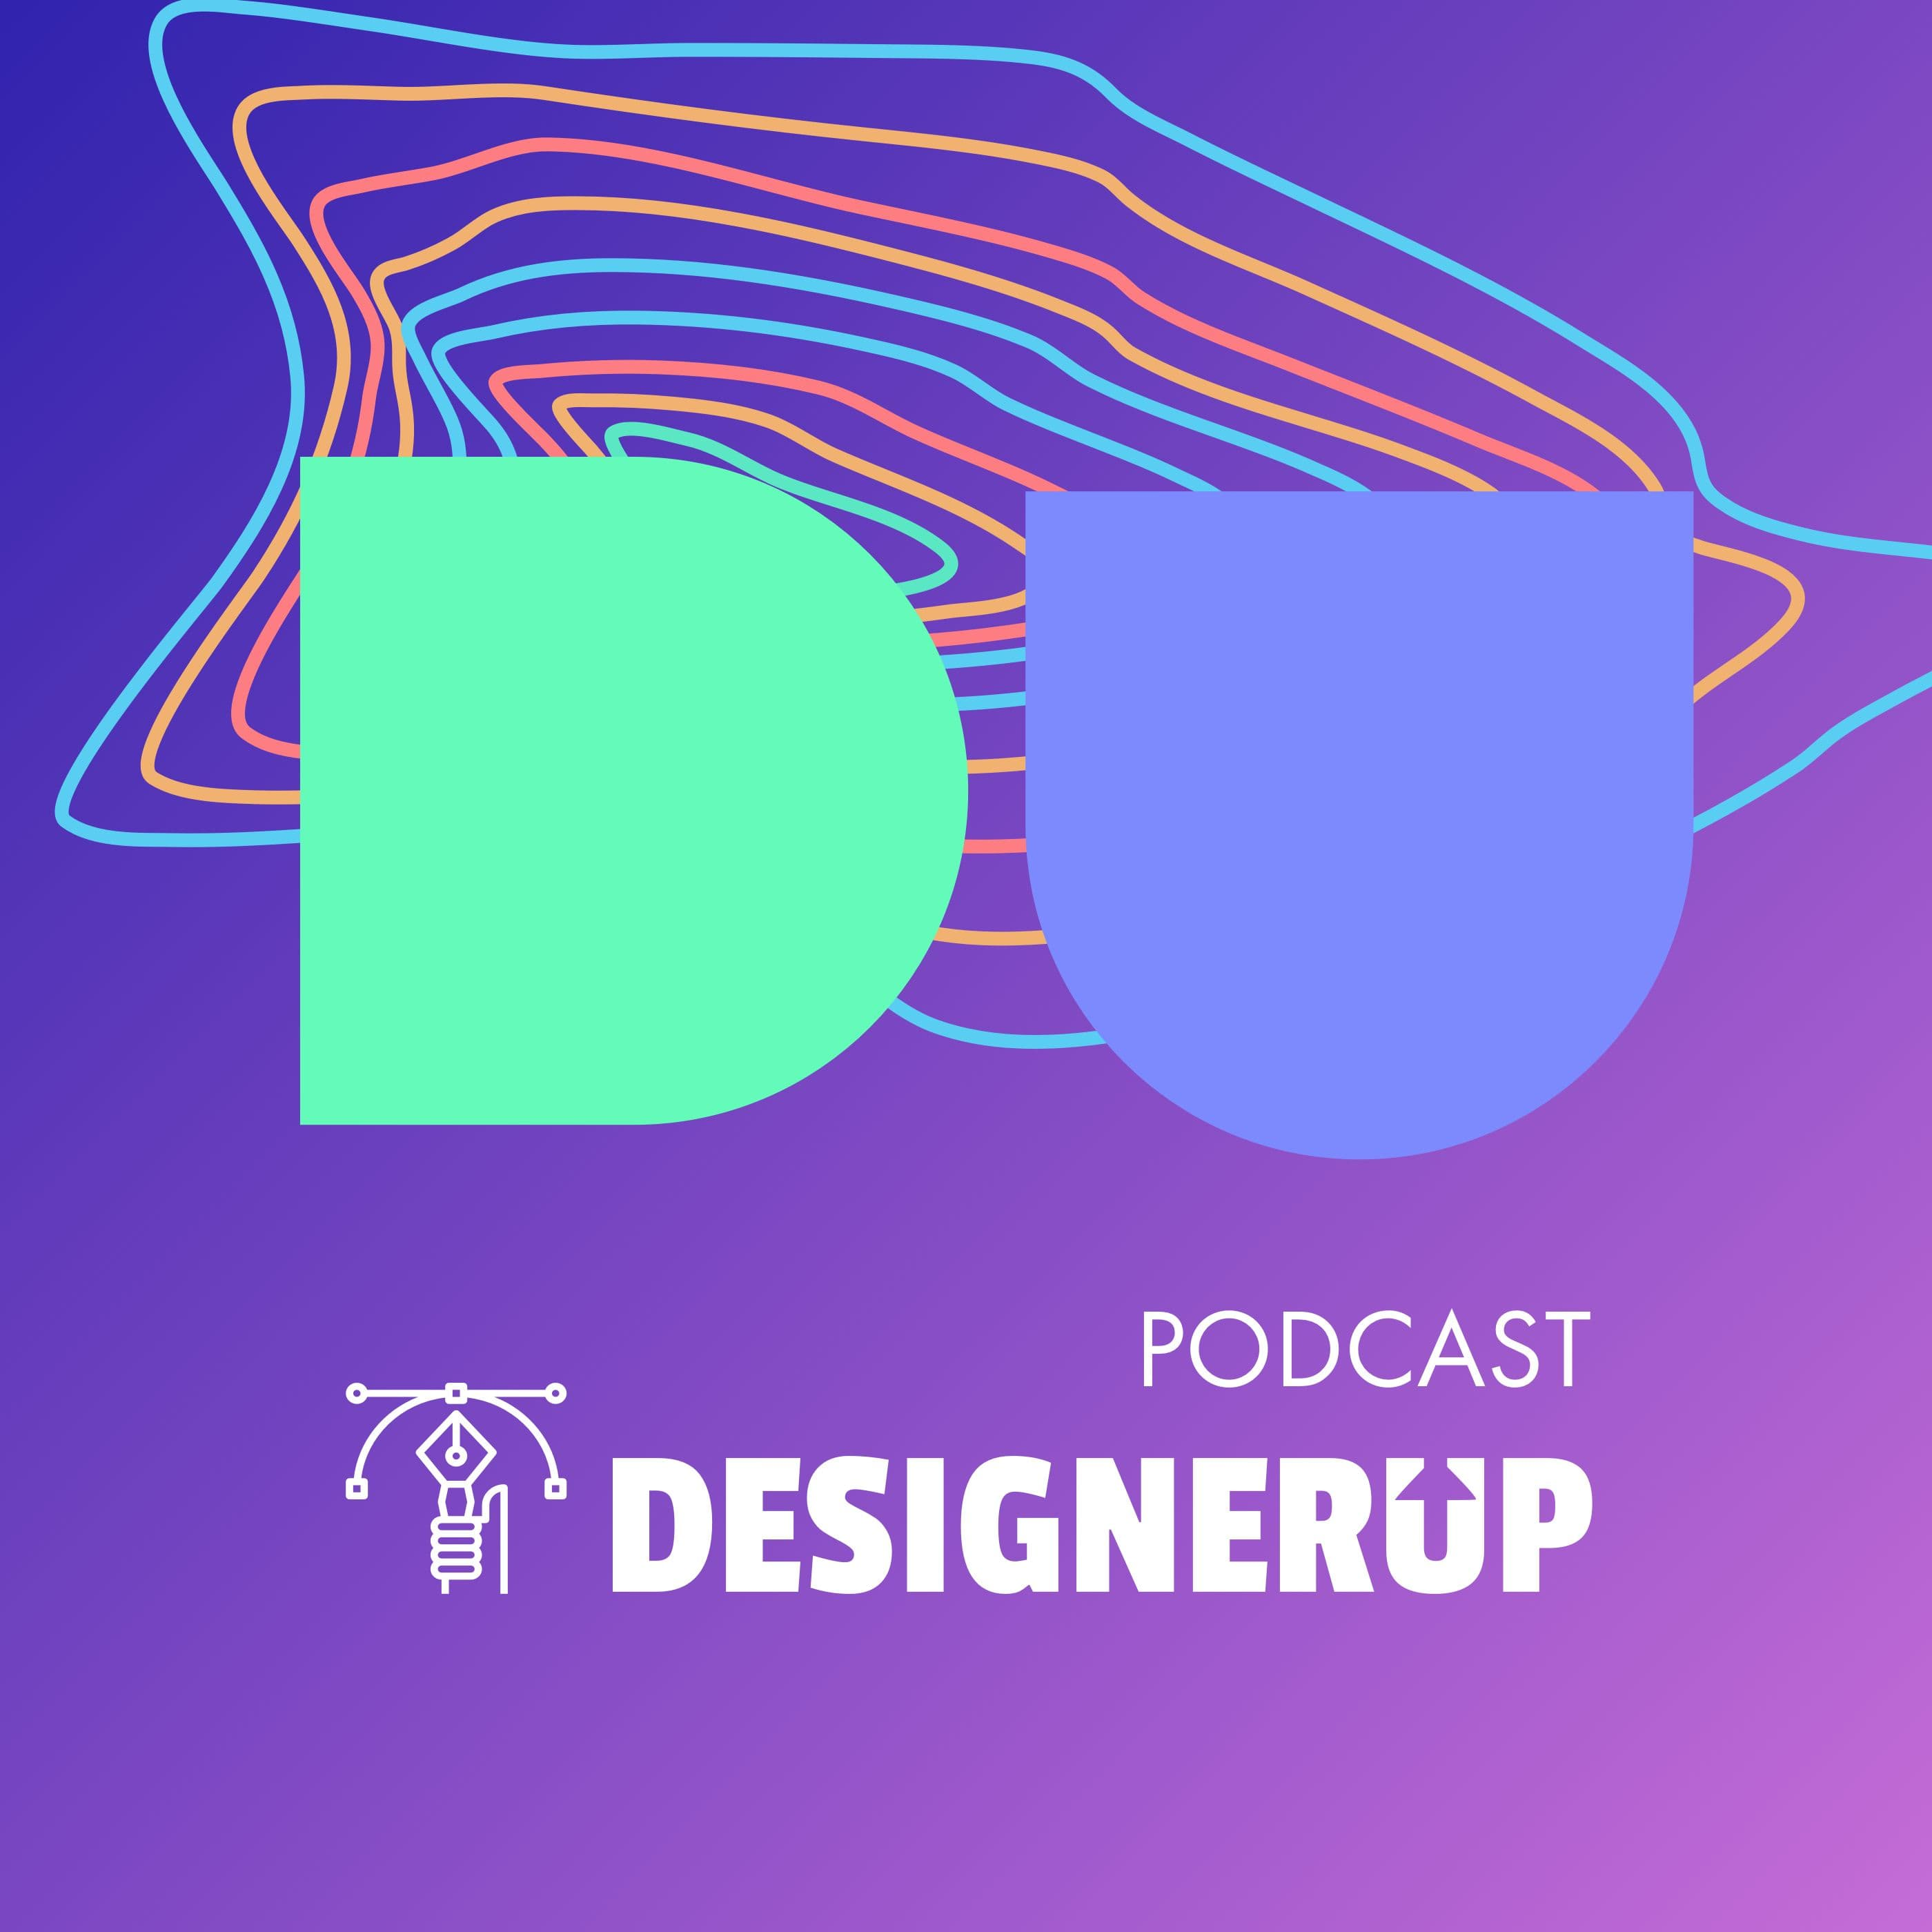 DesignerUp Podcast podcast show image